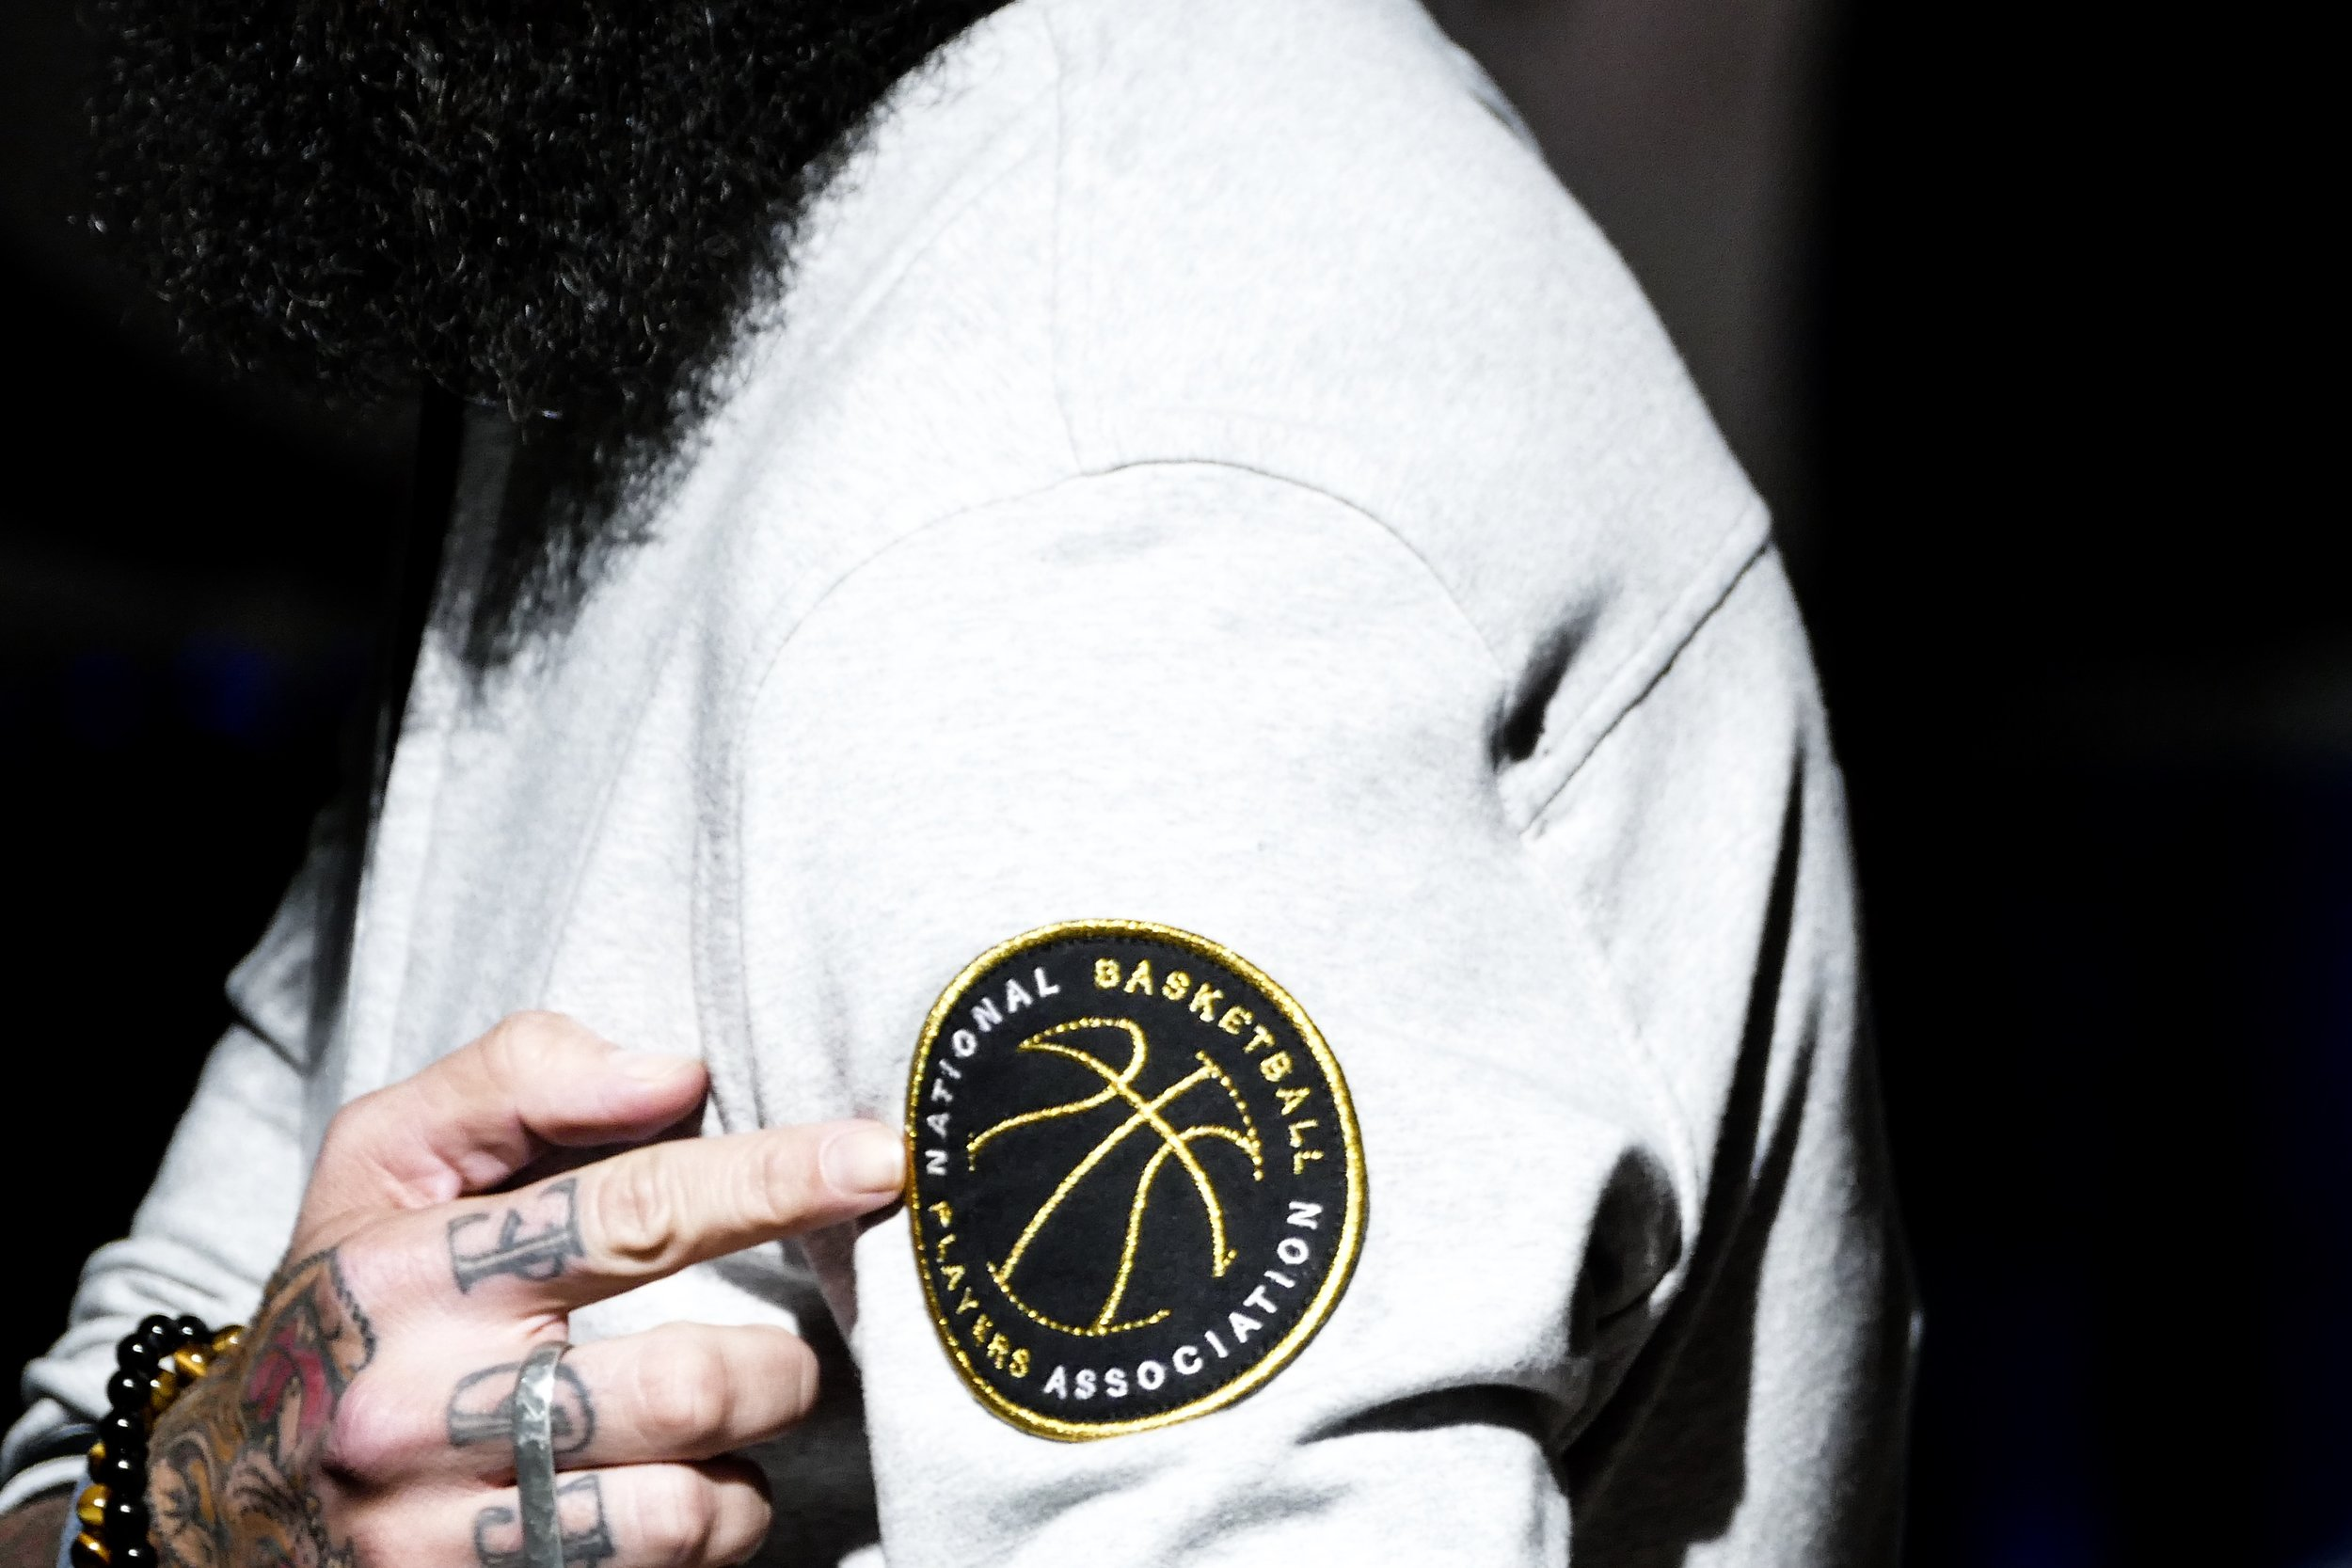 Grungy Gentleman x National Basketball Players Association Collab